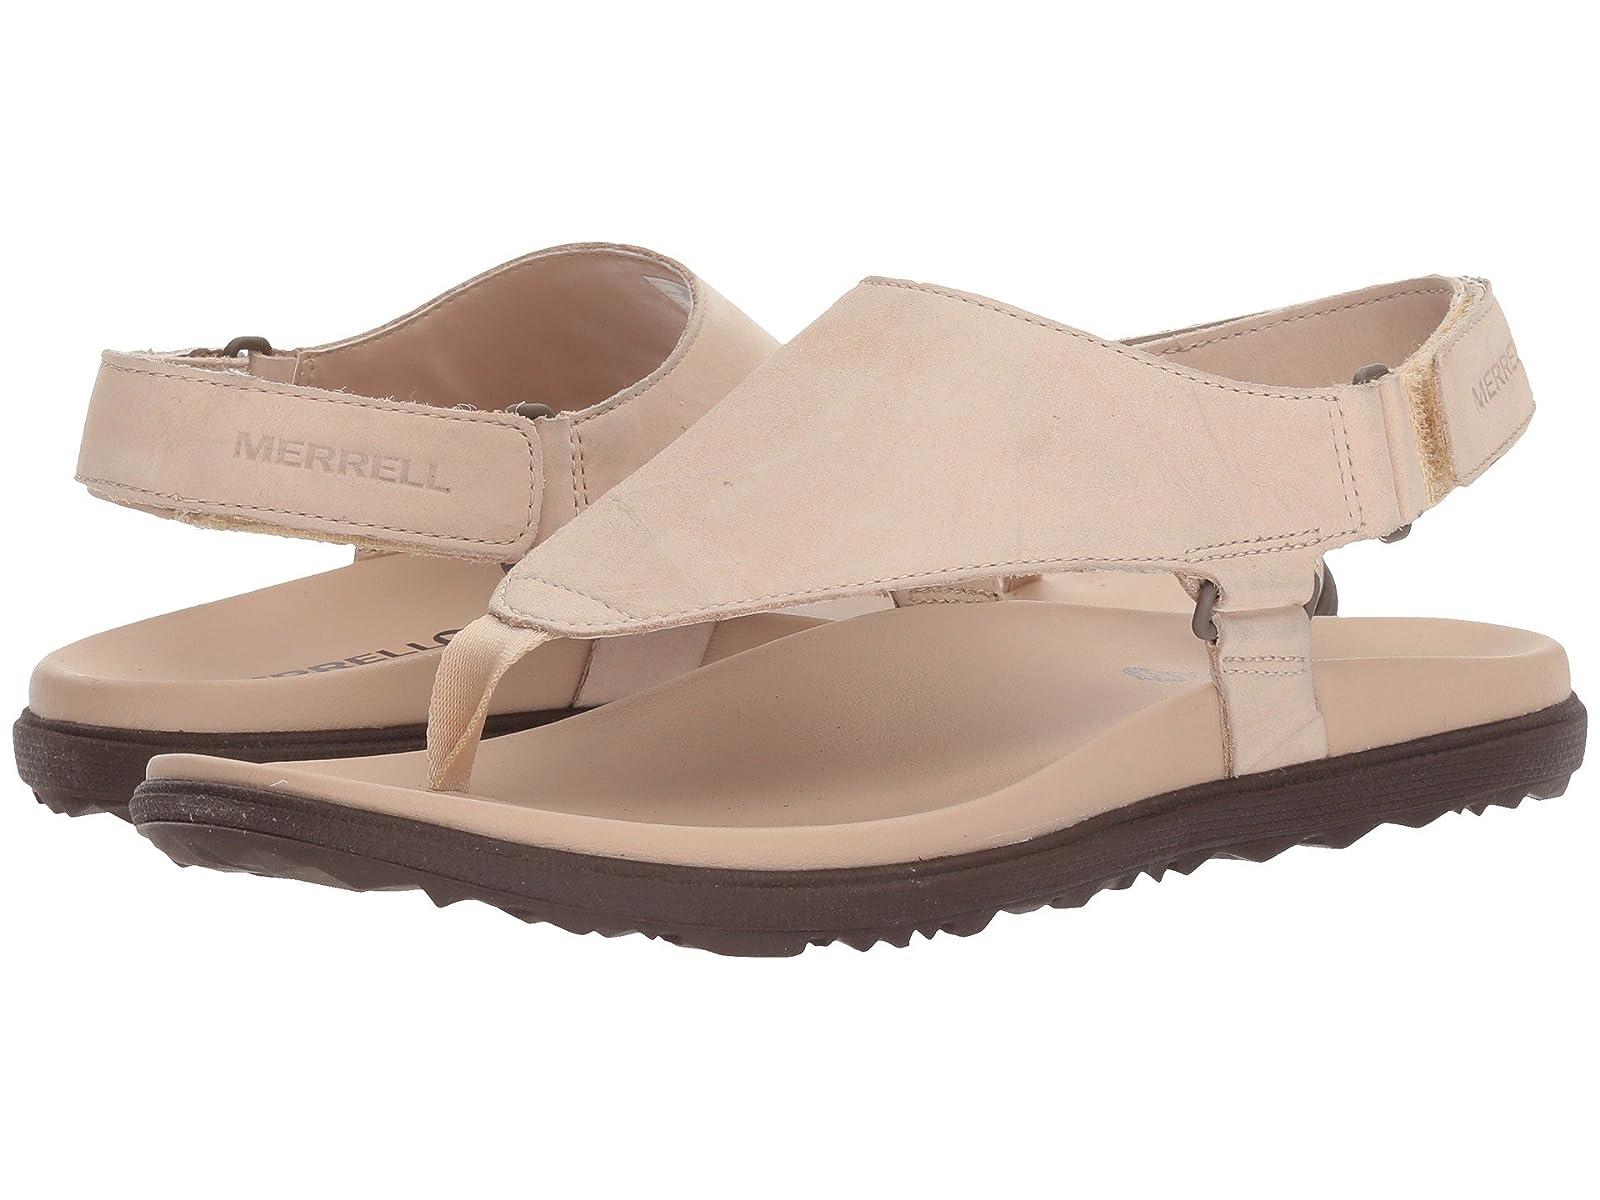 Merrell Around Town Sunvue PostCheap and distinctive eye-catching shoes